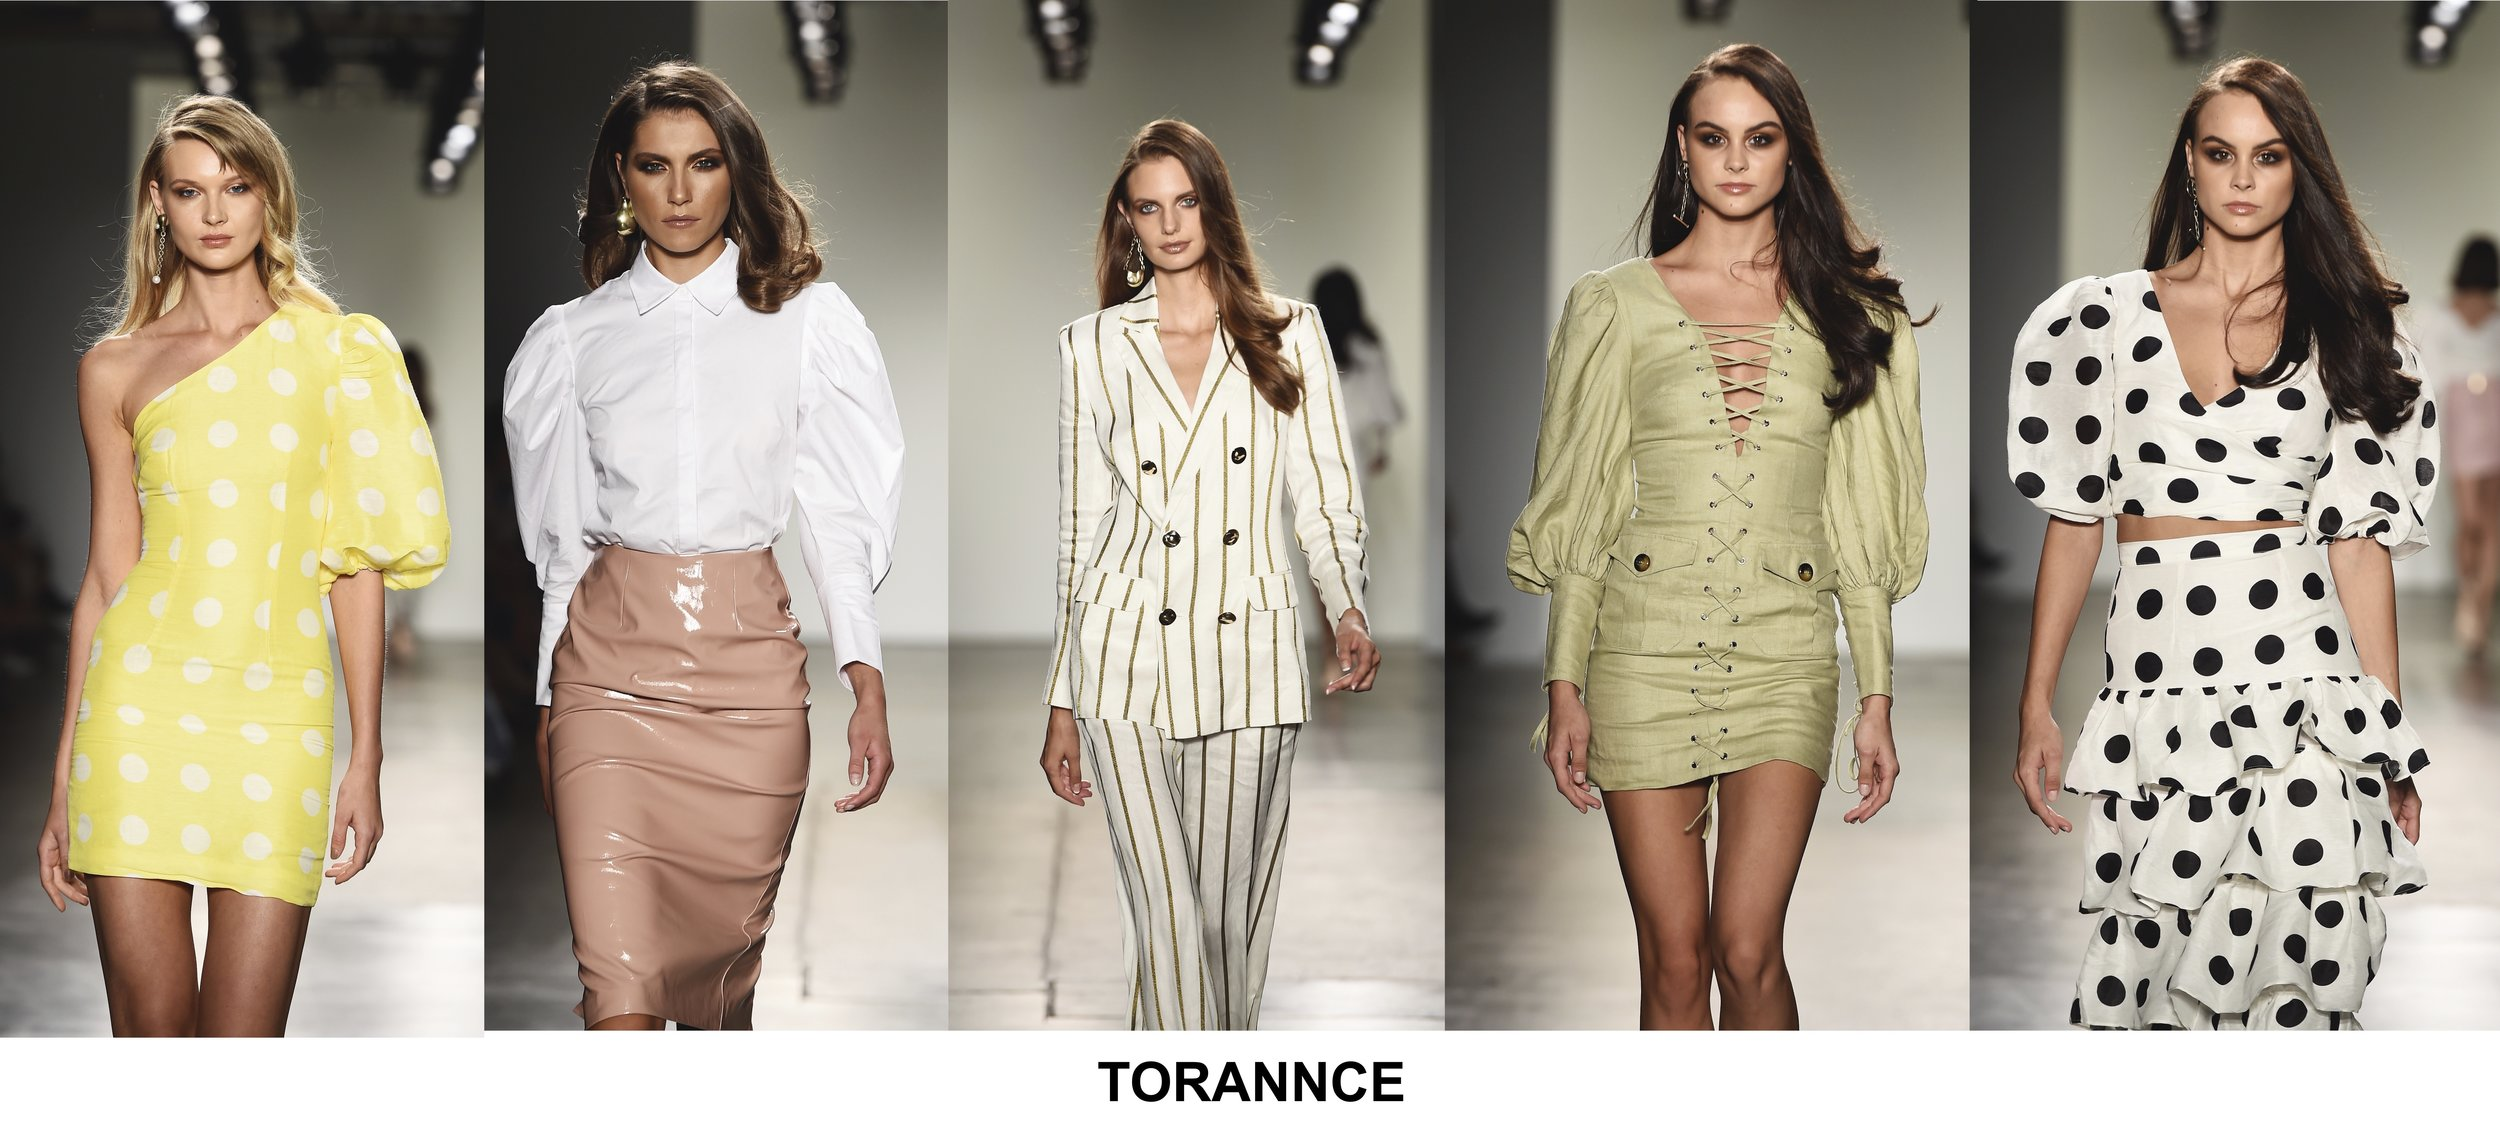 Fashion Palette - TORANNCE.jpg